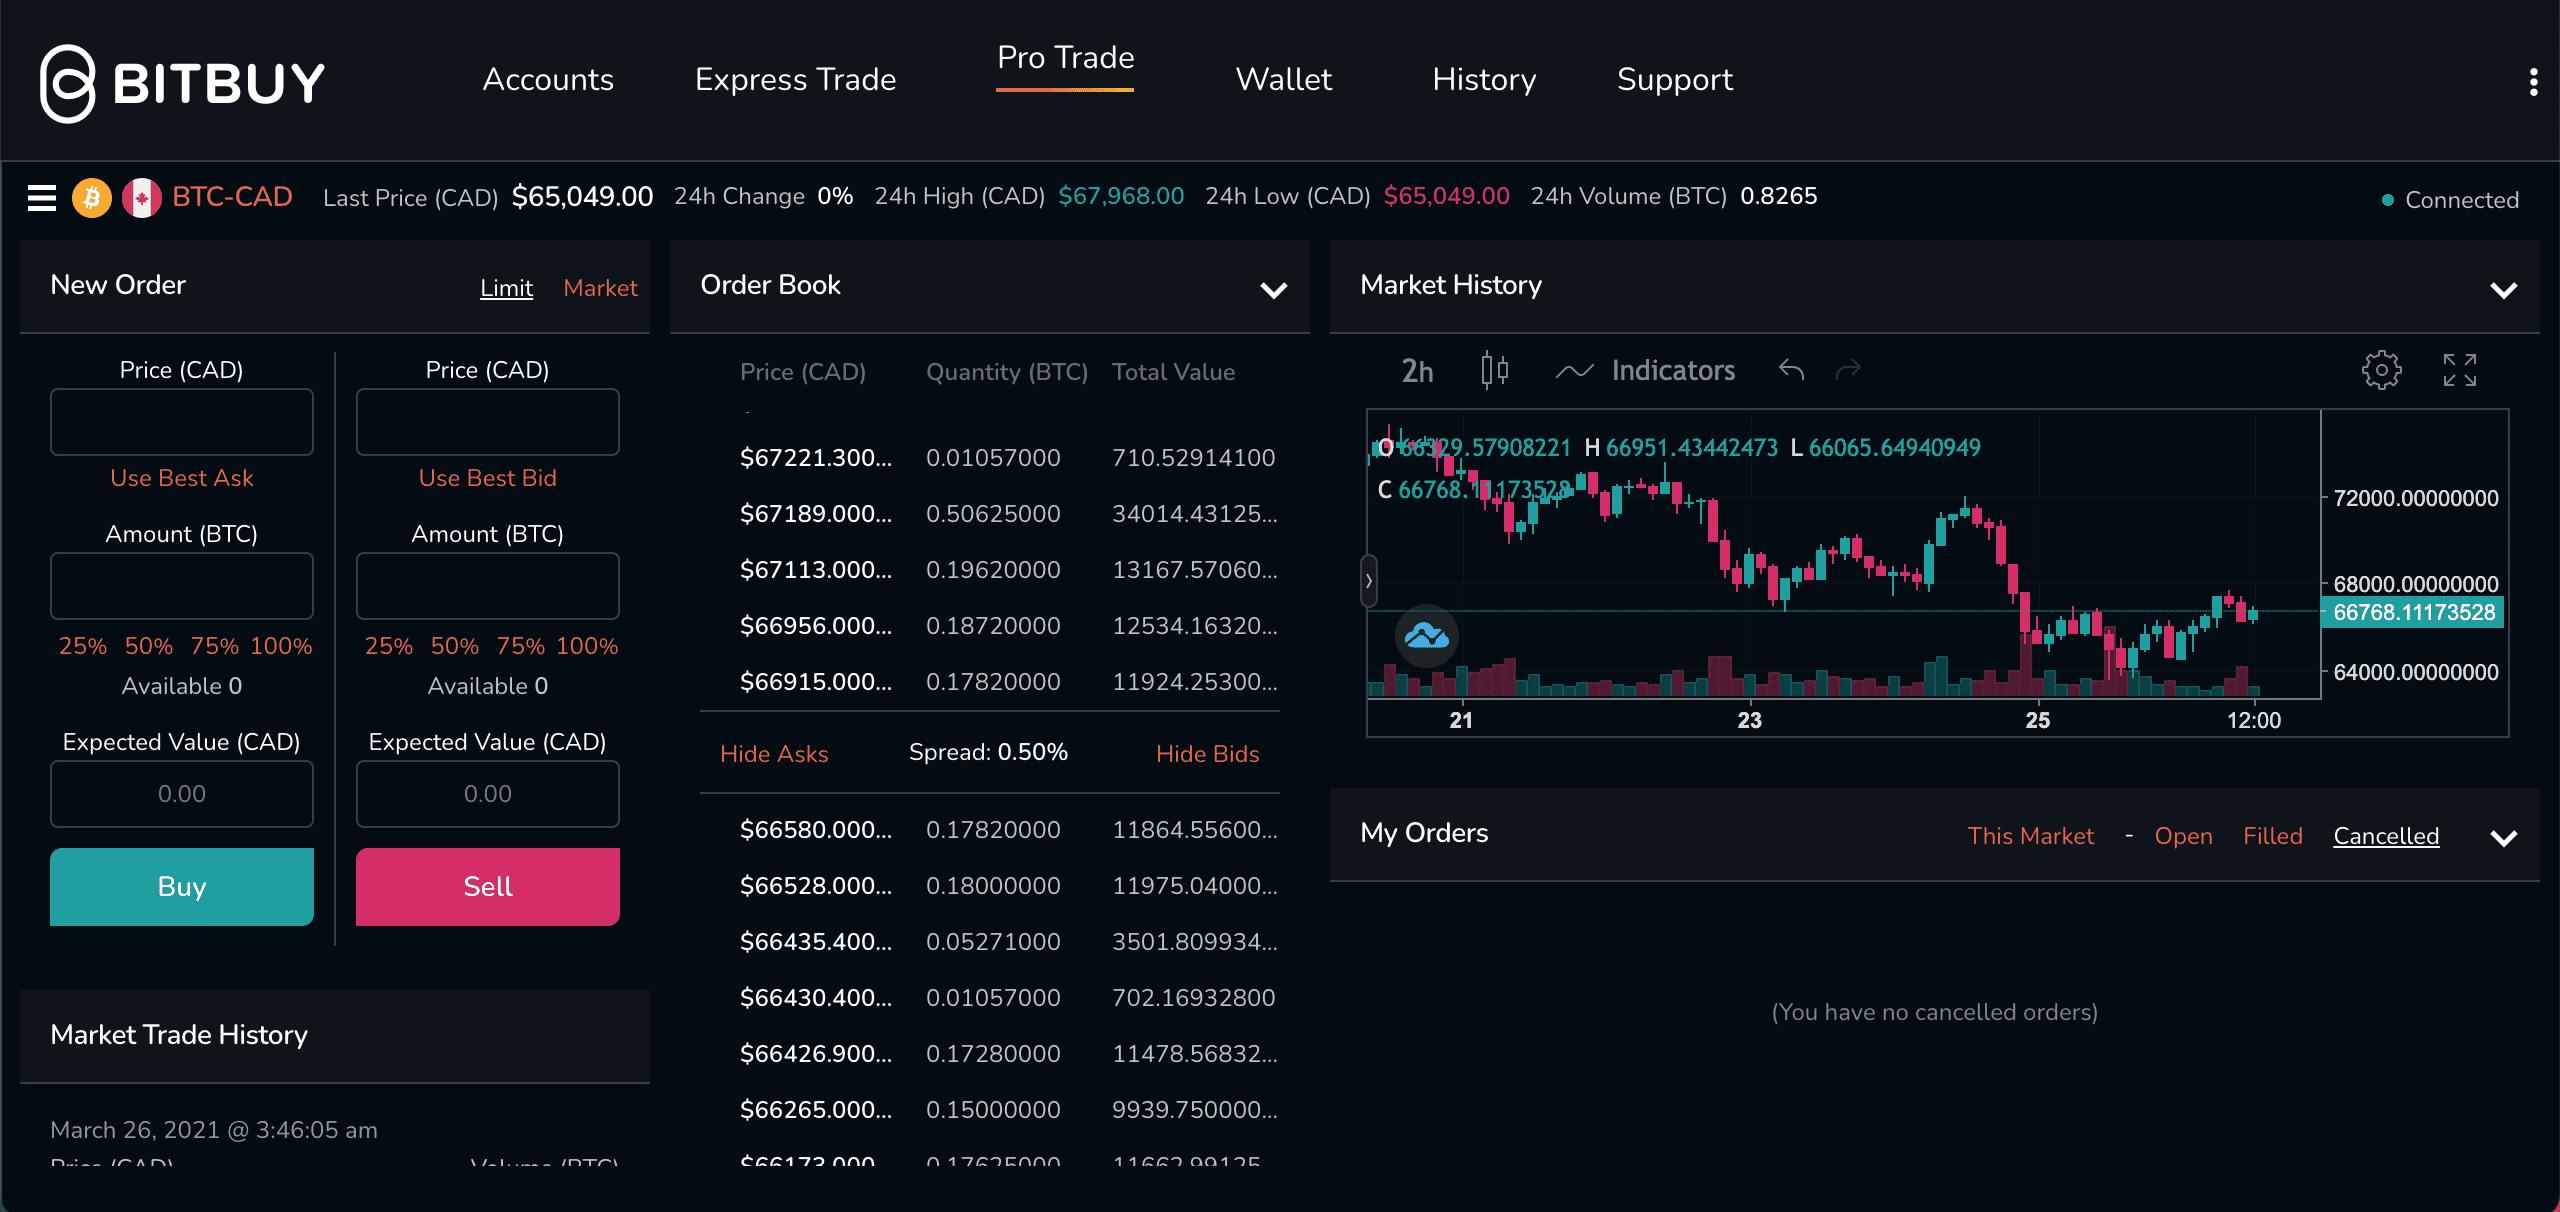 bitbuy pro trade plateforme bitcoin